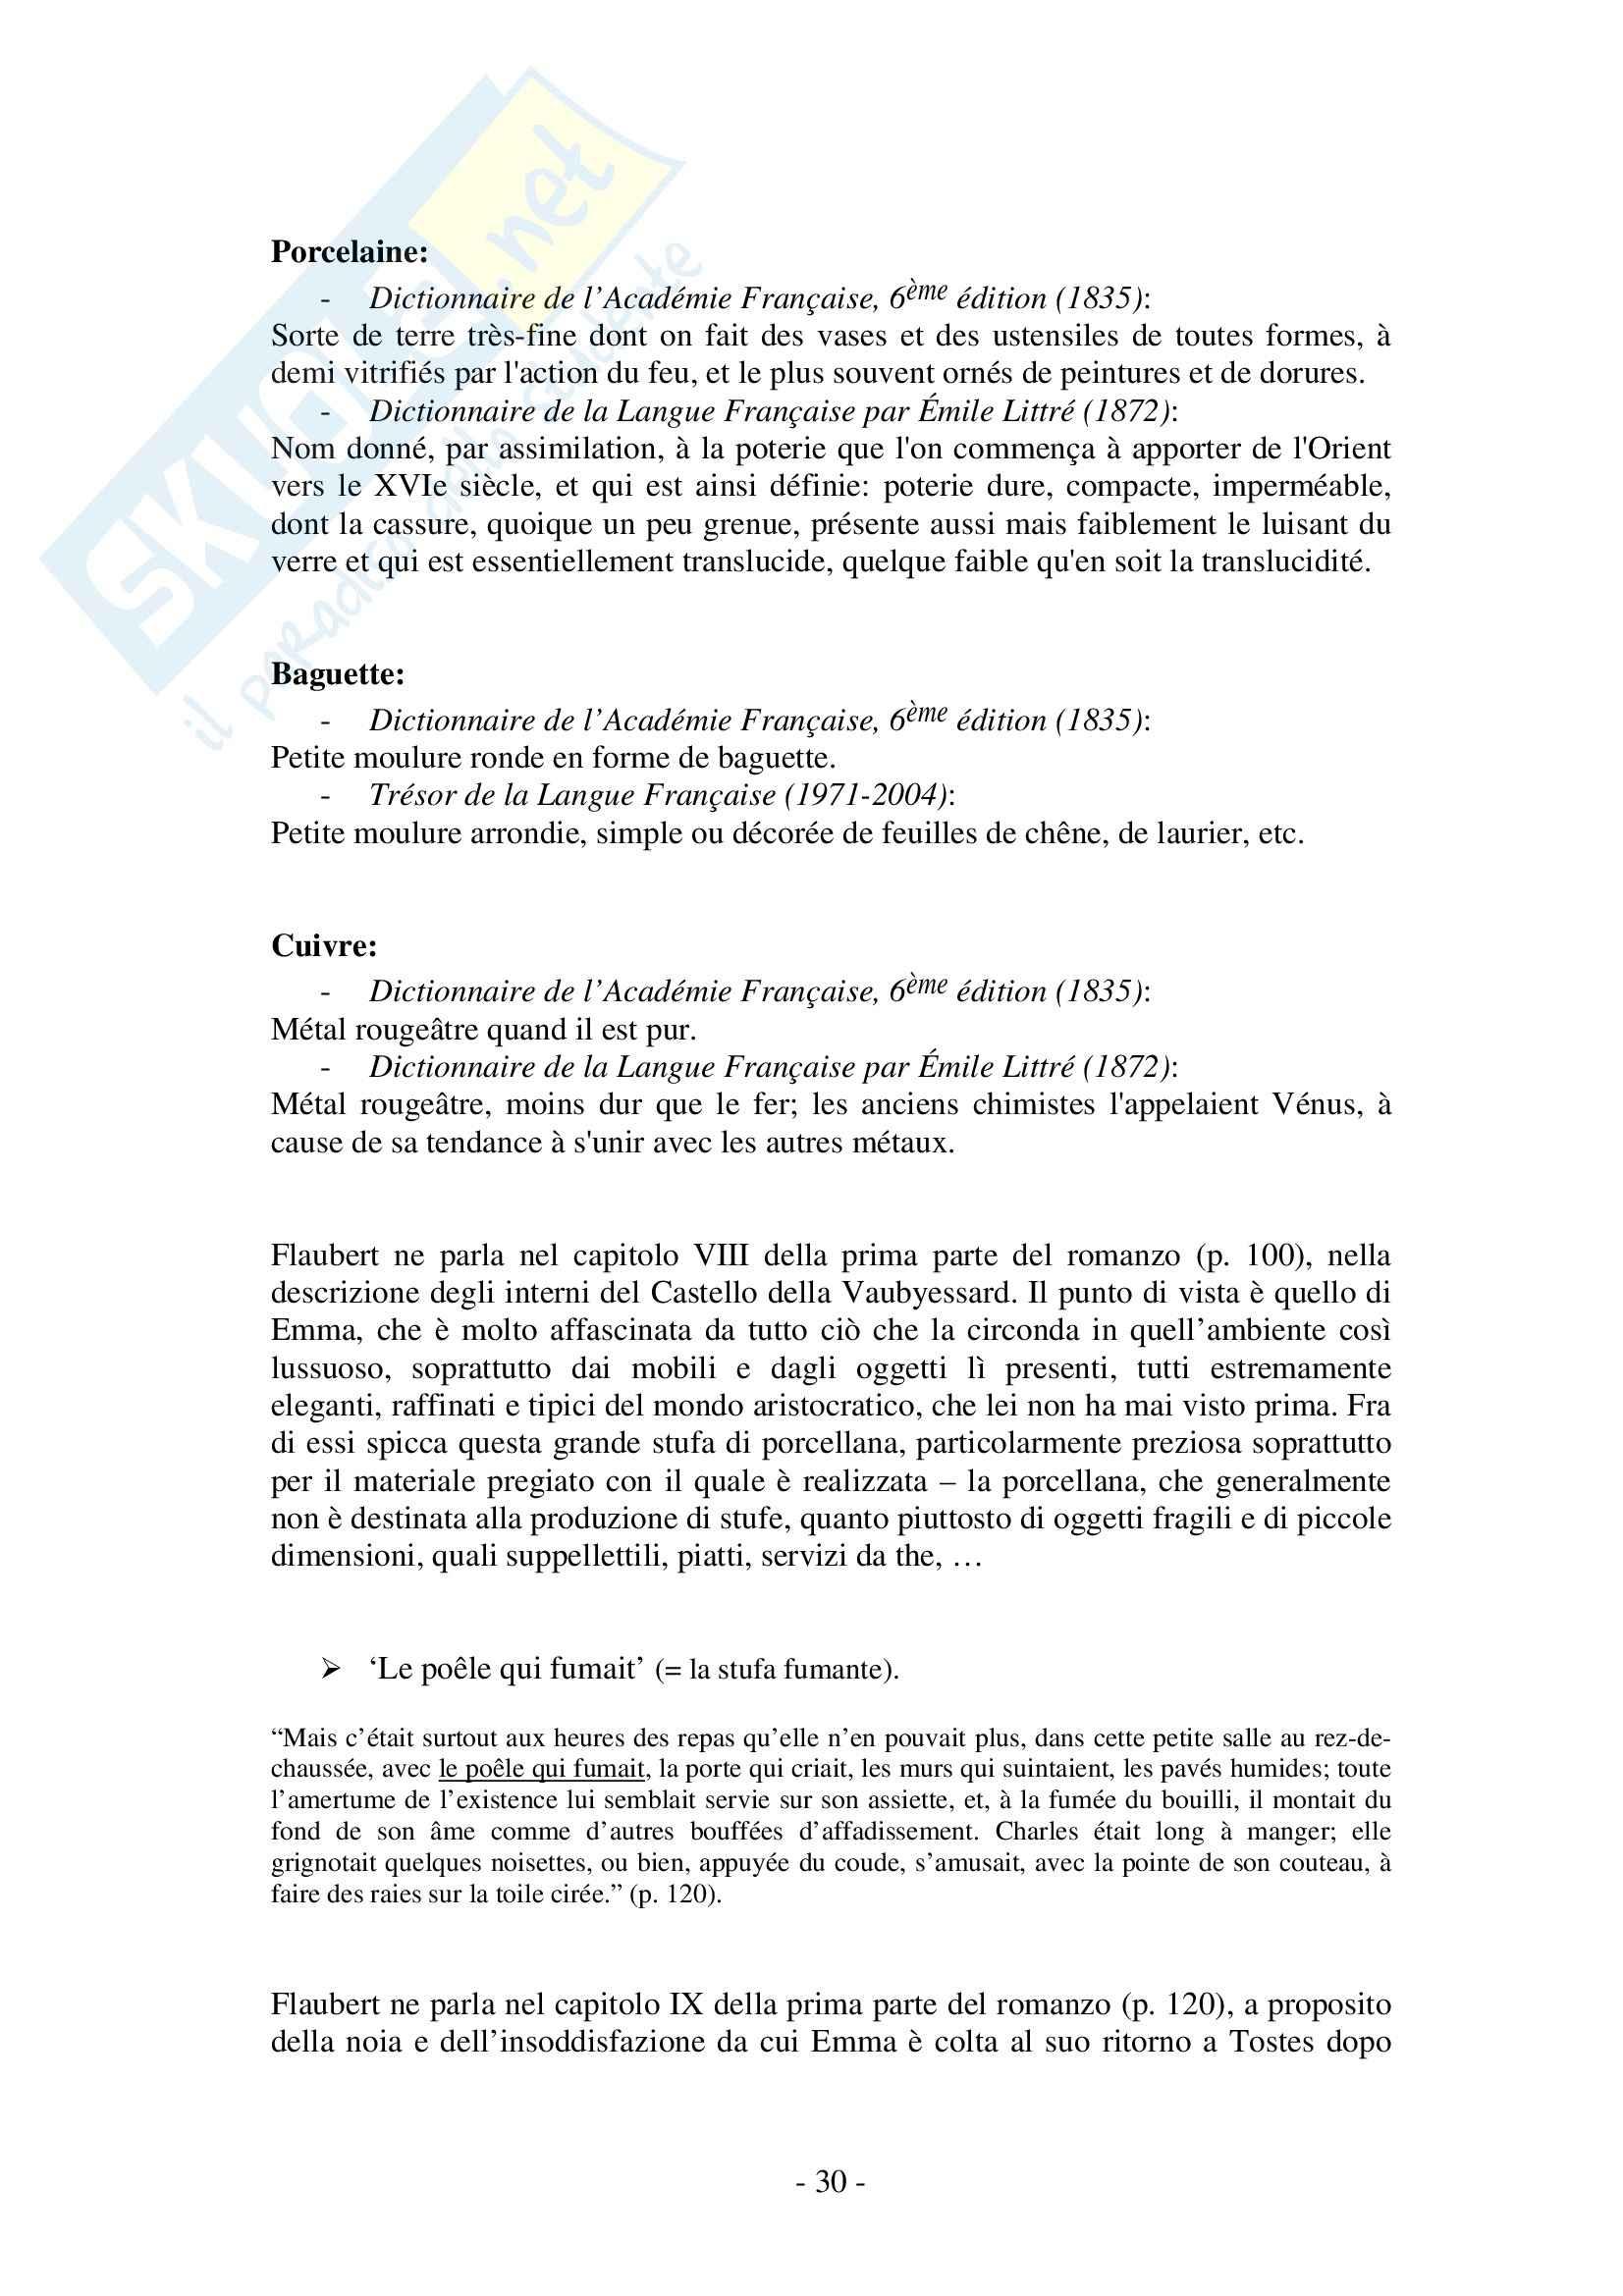 Tesi, Flaubert: il Tema dell'arredamento in Madame Bovary Pag. 31